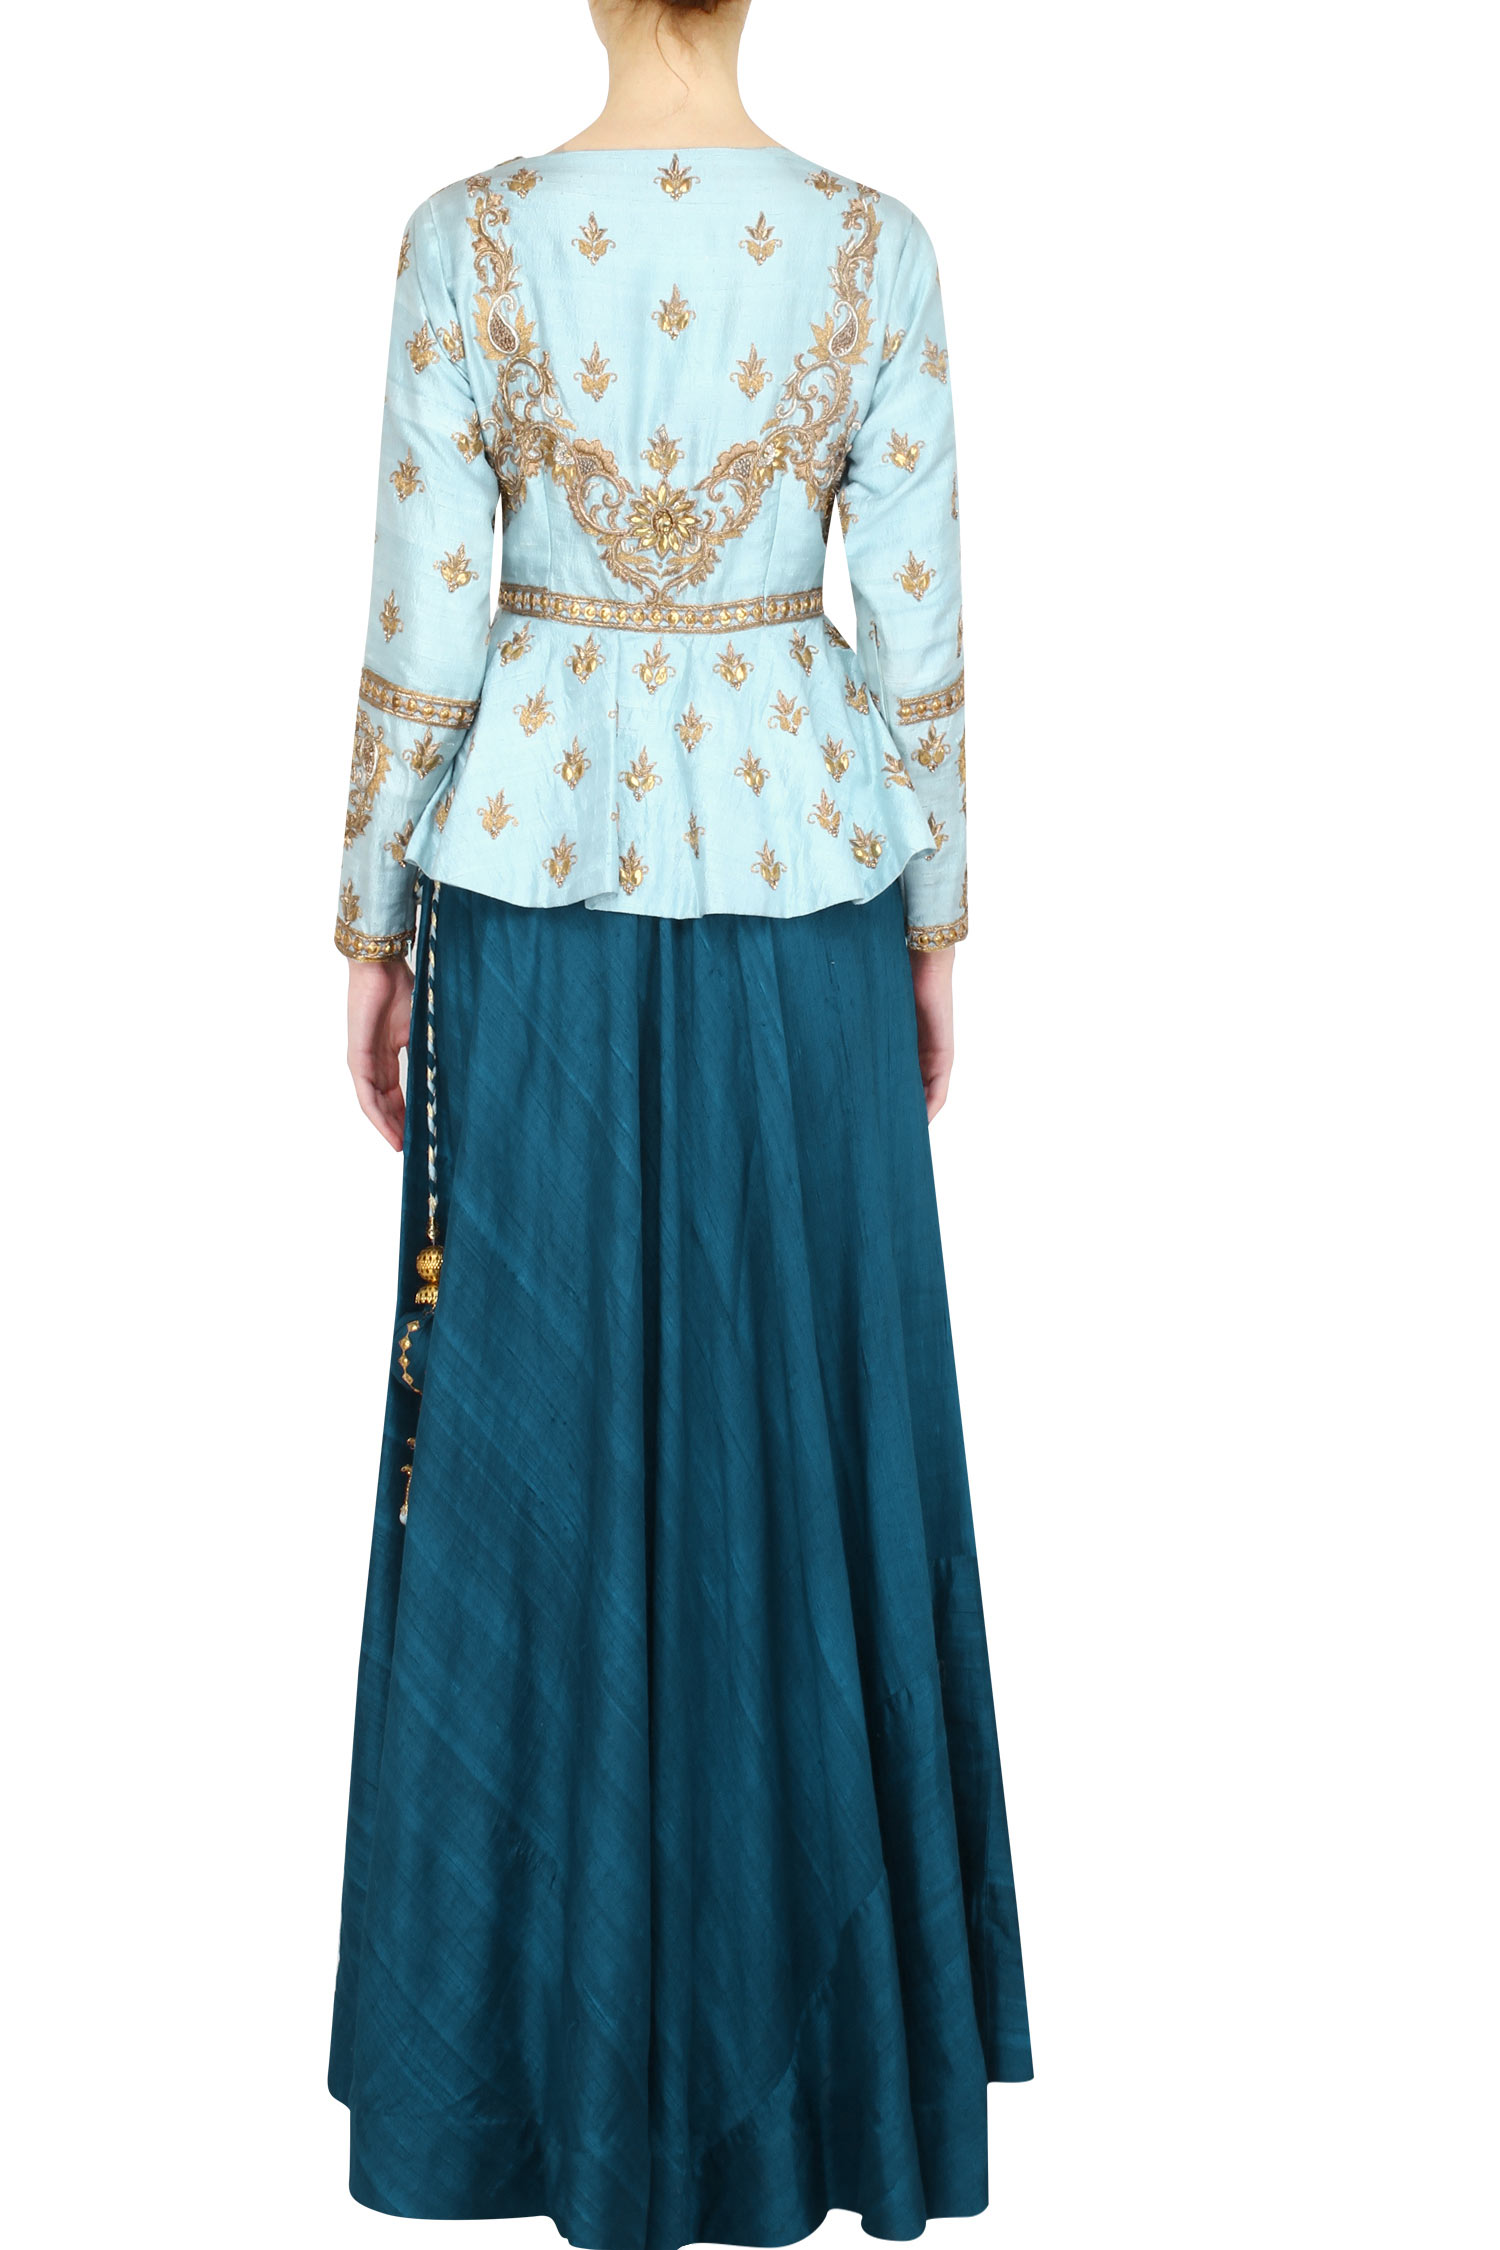 blue peplum teal blue skirt and twisted dupatta